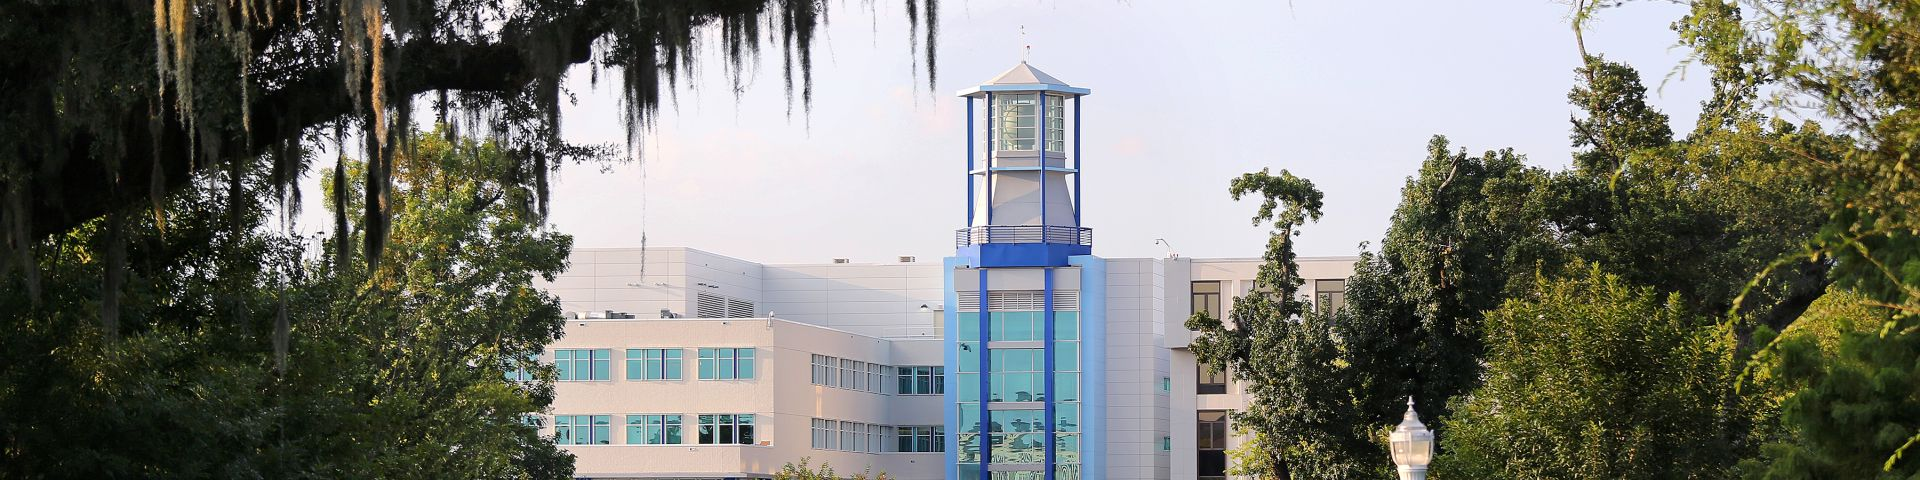 Childrensandwomenshospital